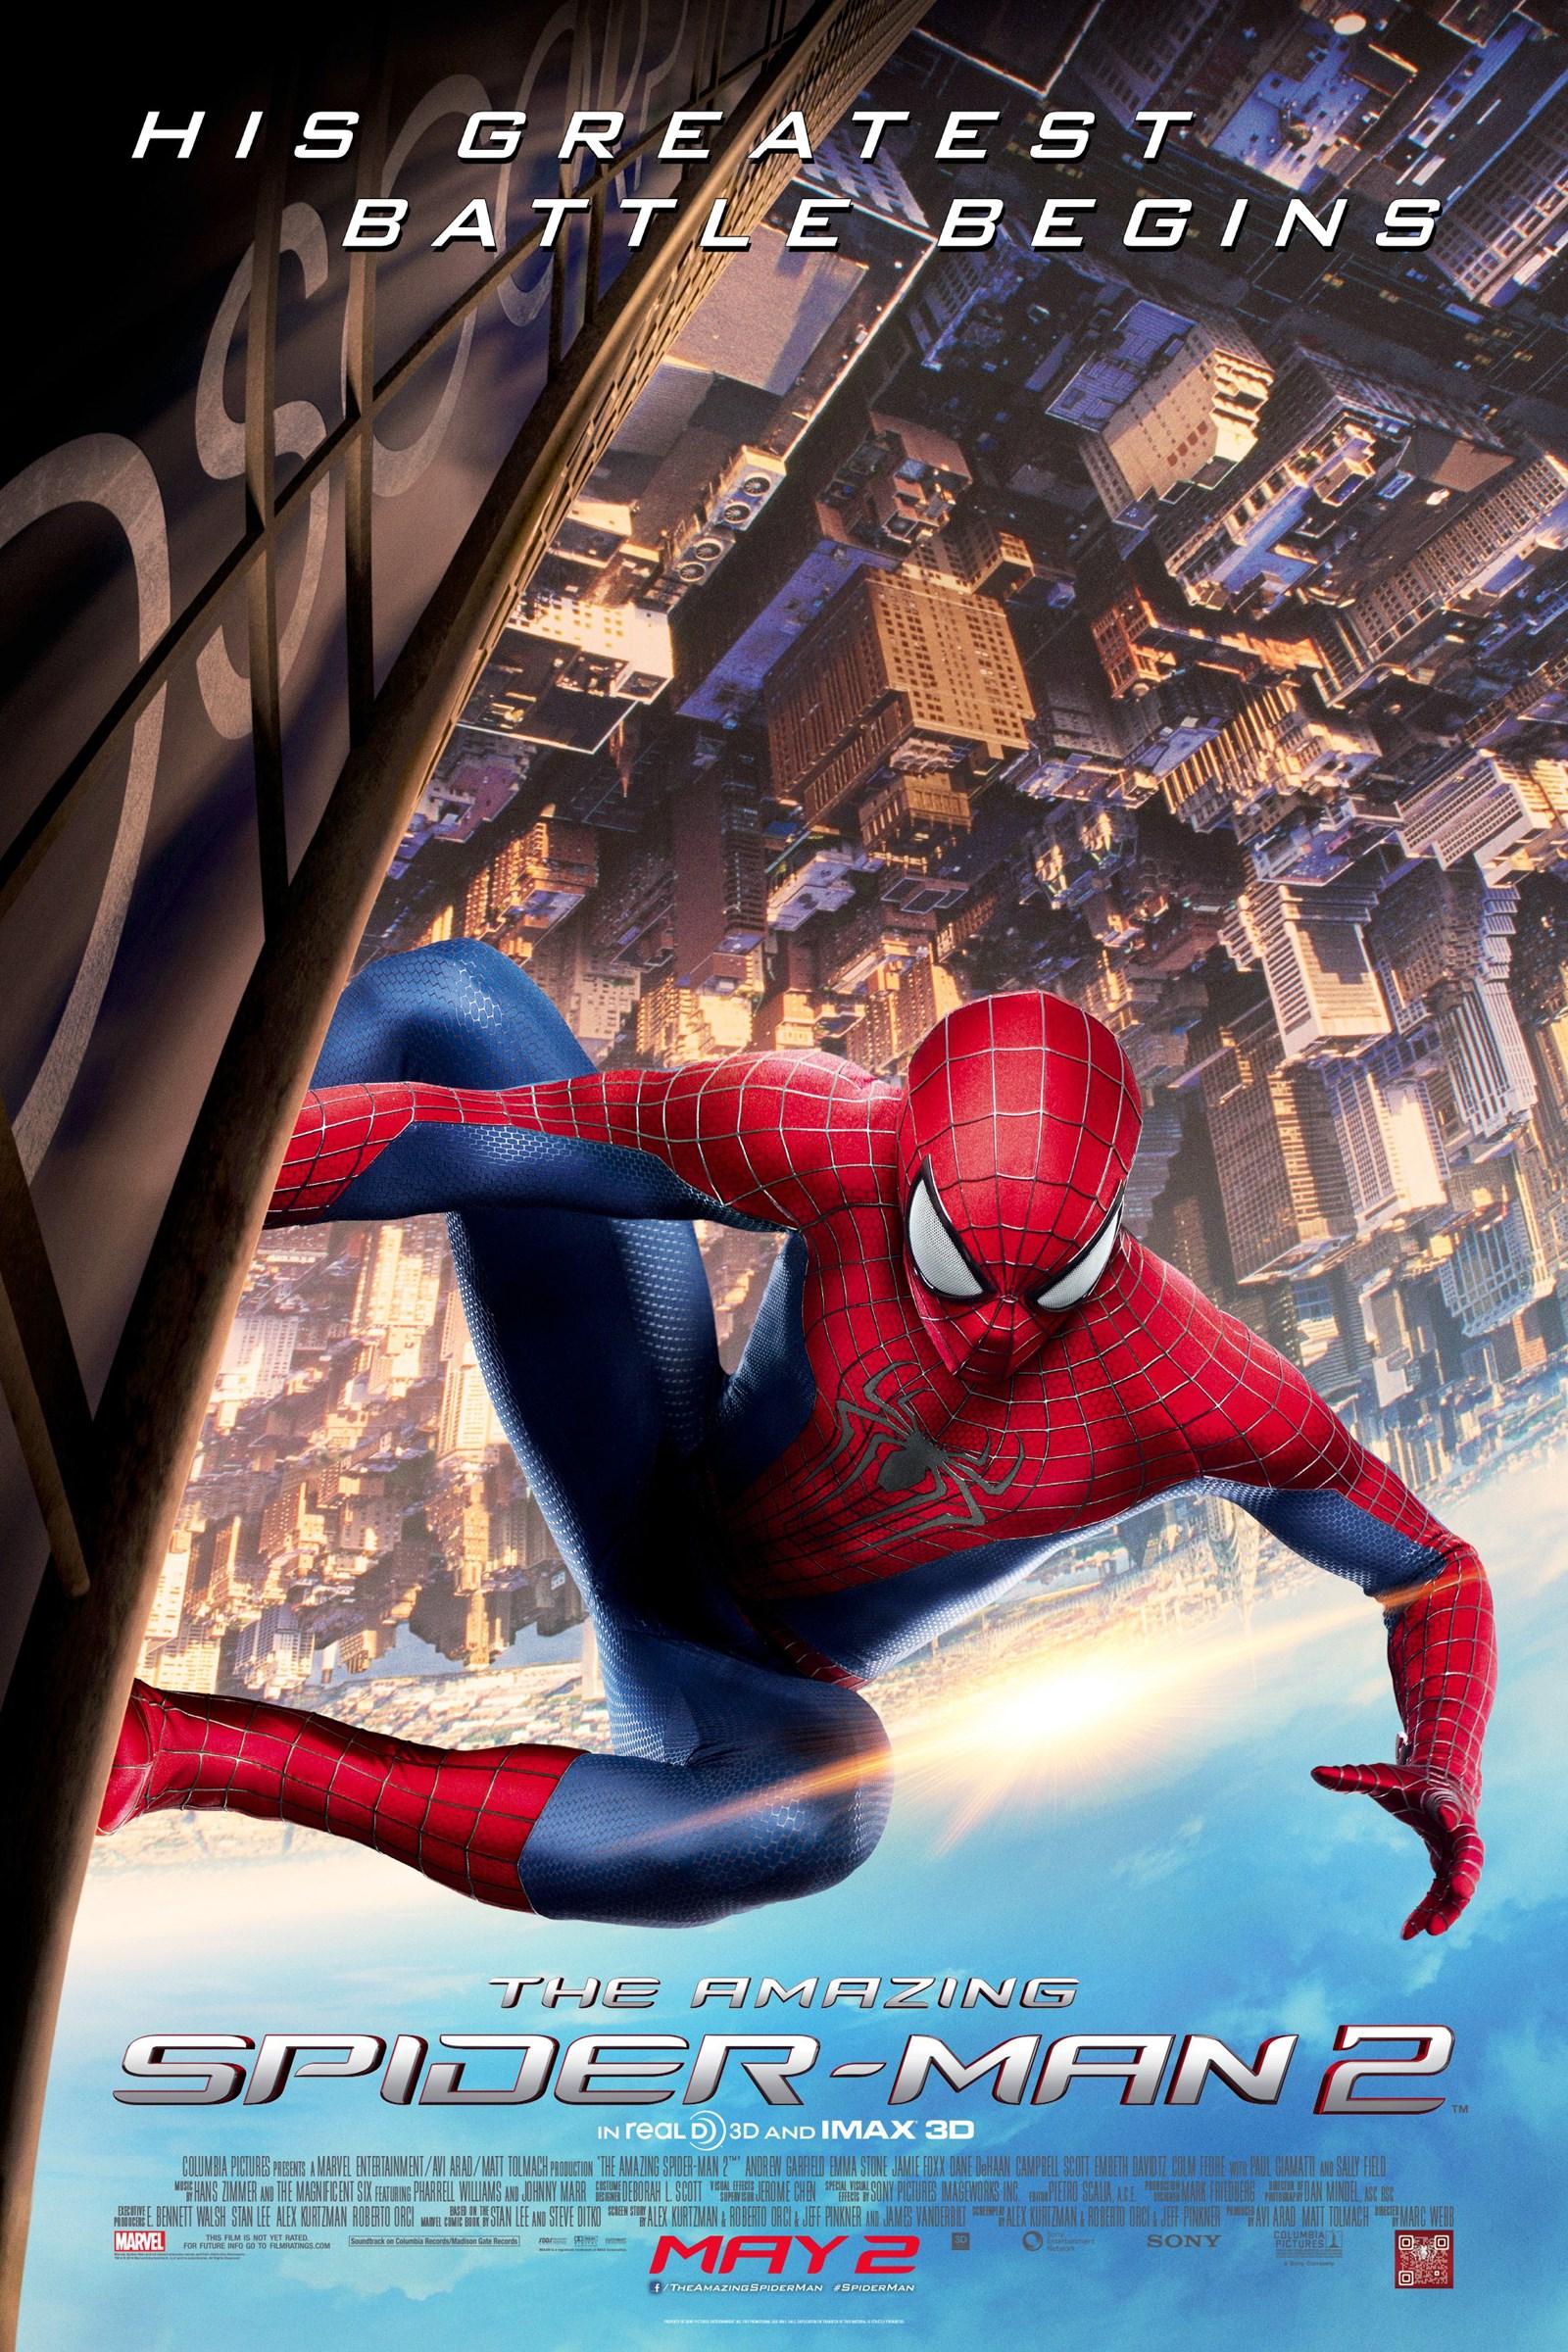 subscene - the amazing spider-man 2 arabic subtitle